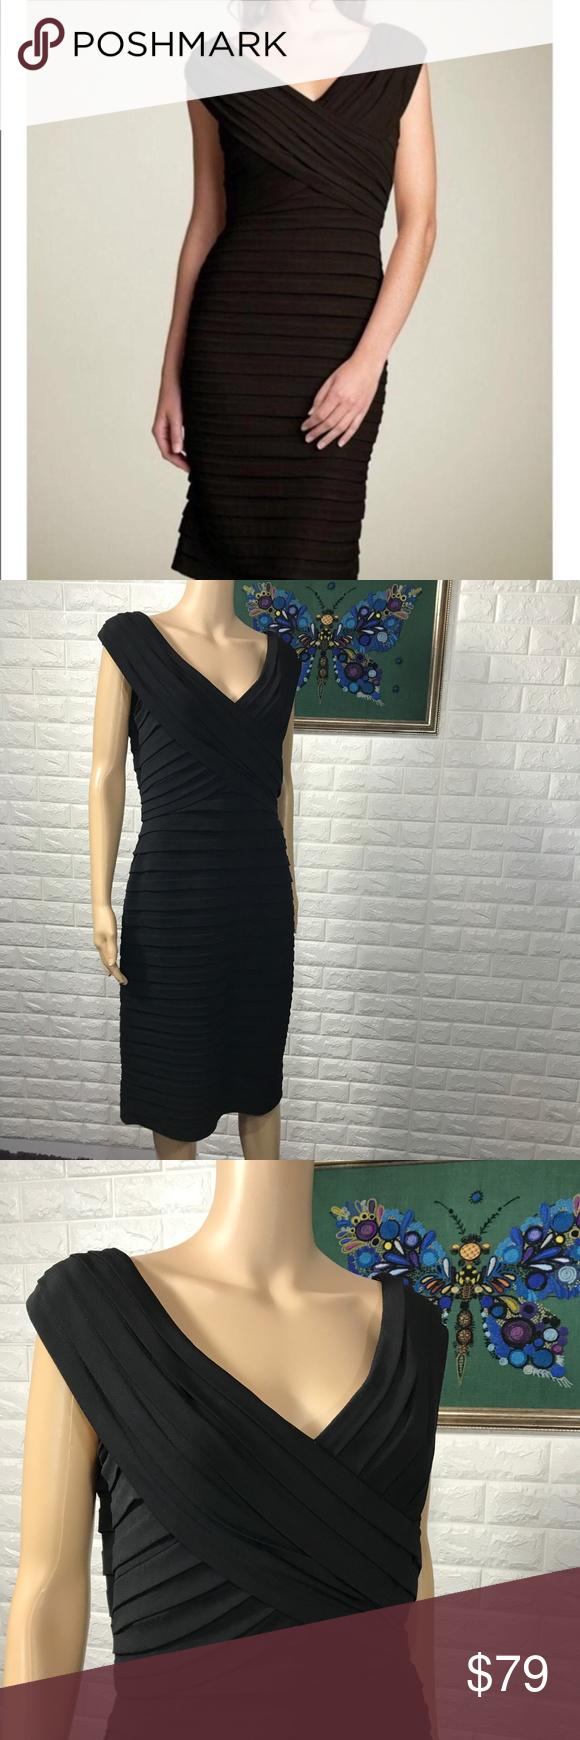 Tadashi Shoji Black Tiered Layered Sheath Dress Sheath Dress Dresses Tadashi Shoji Dresses [ 1740 x 580 Pixel ]